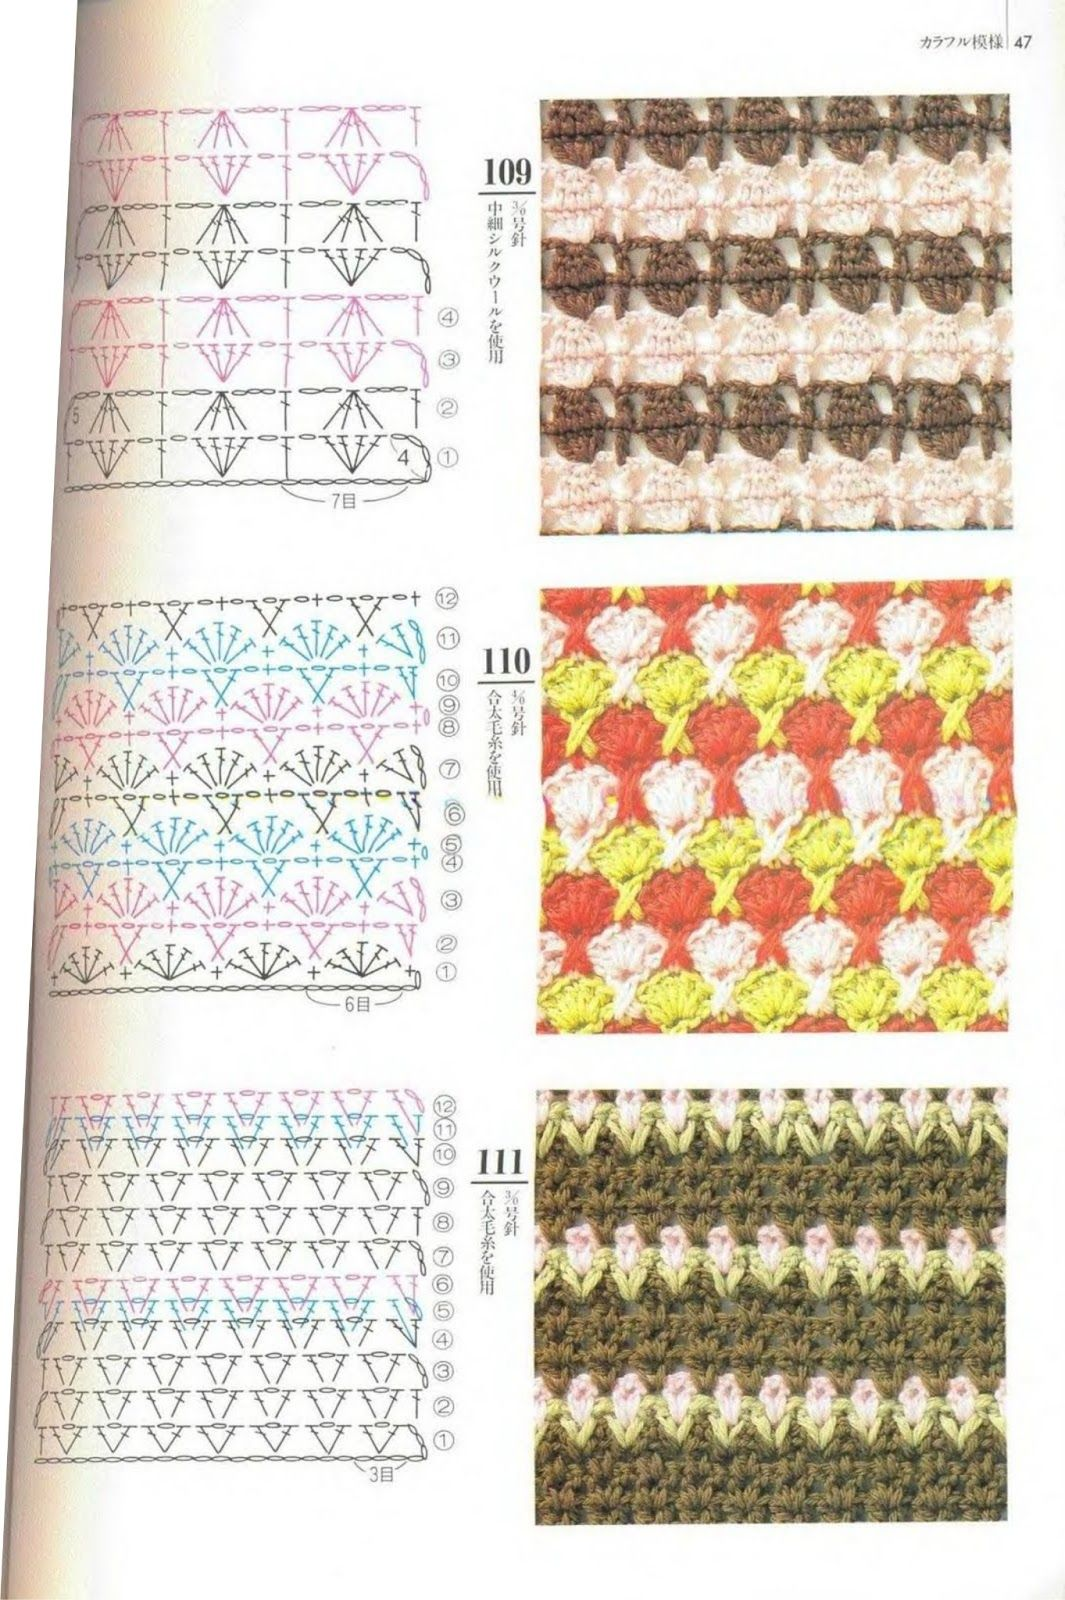 SOLO PUNTOS: Crochet Dos colores | Croshet | Pinterest | Croché ...